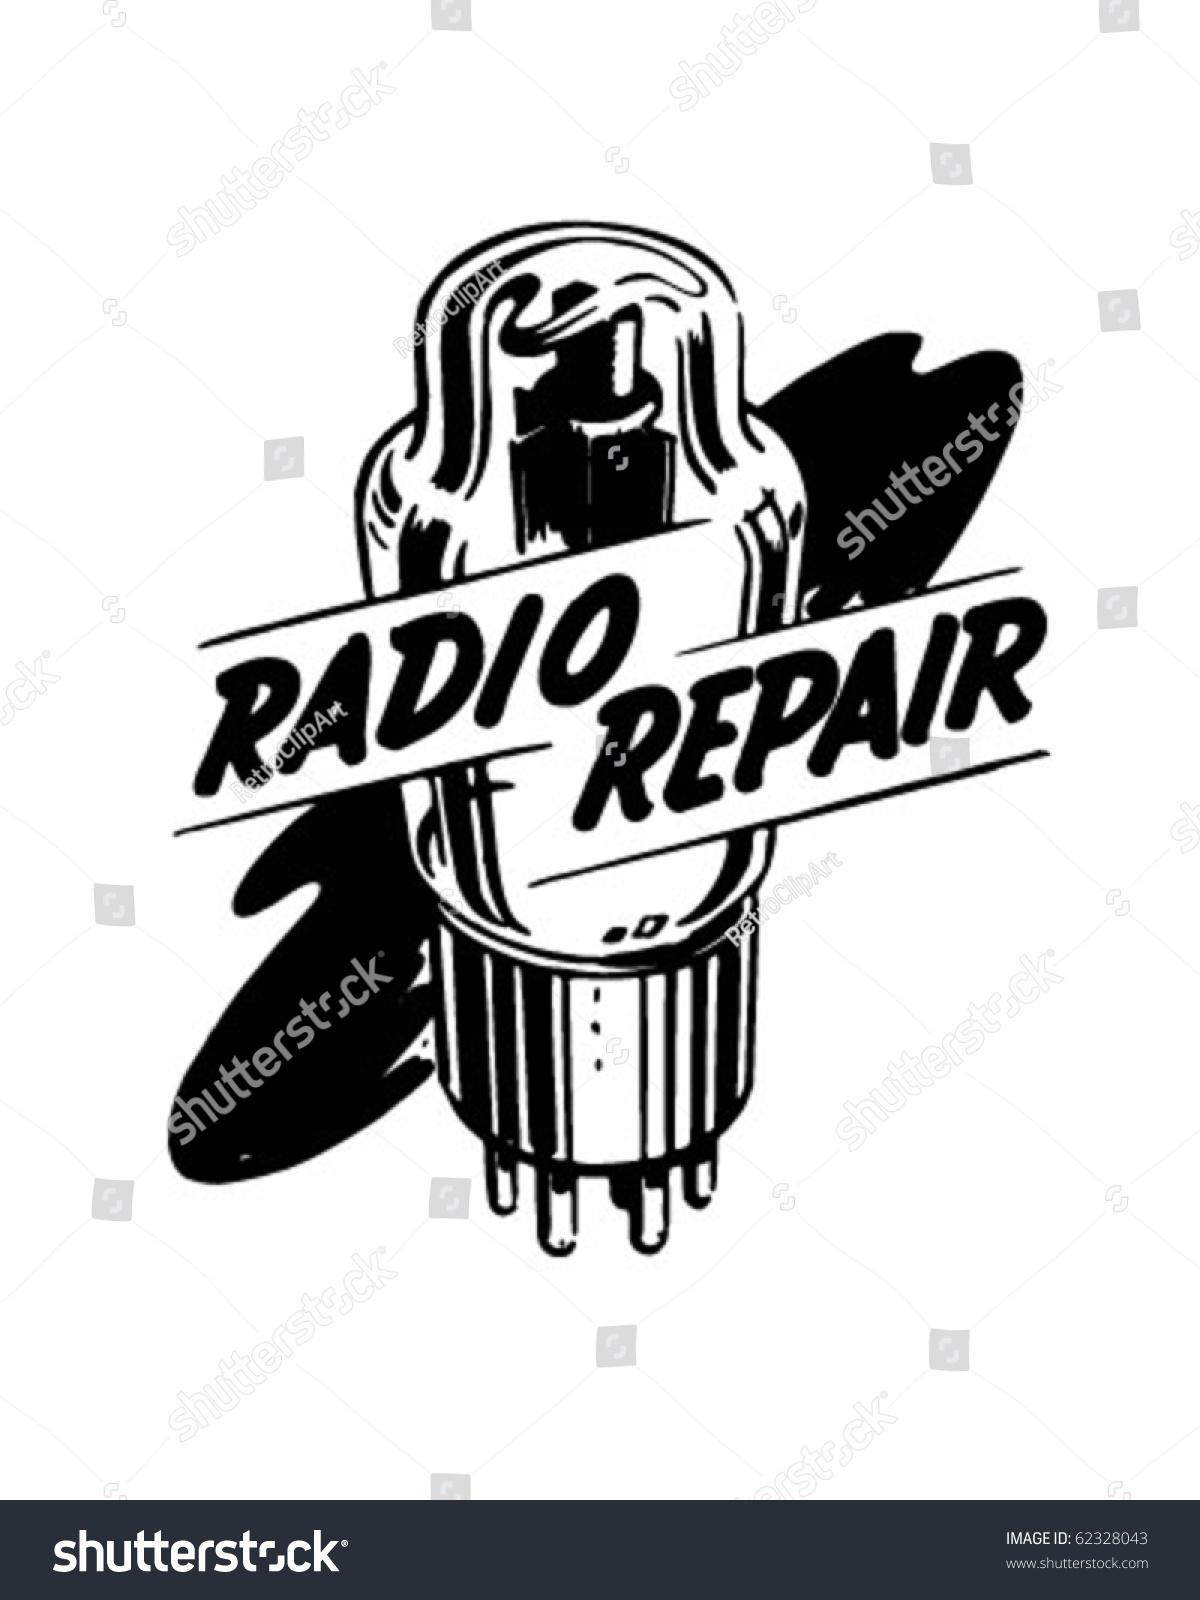 hight resolution of radio repair 1 ad header retro clipart